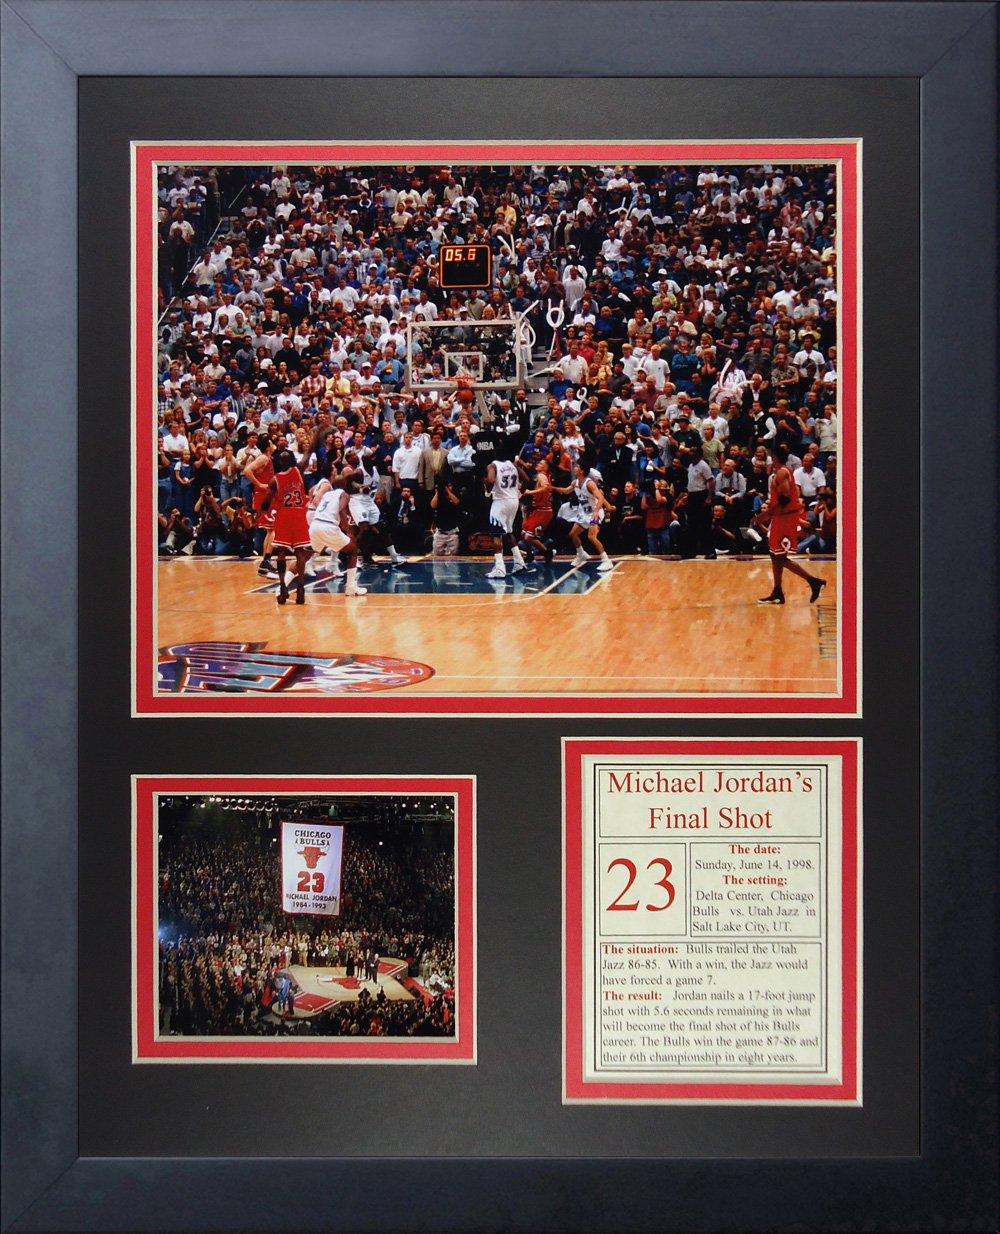 Legends Never Die ''Michael Jordan Final Shot Framed Photo Collage, 11 x 14-Inch